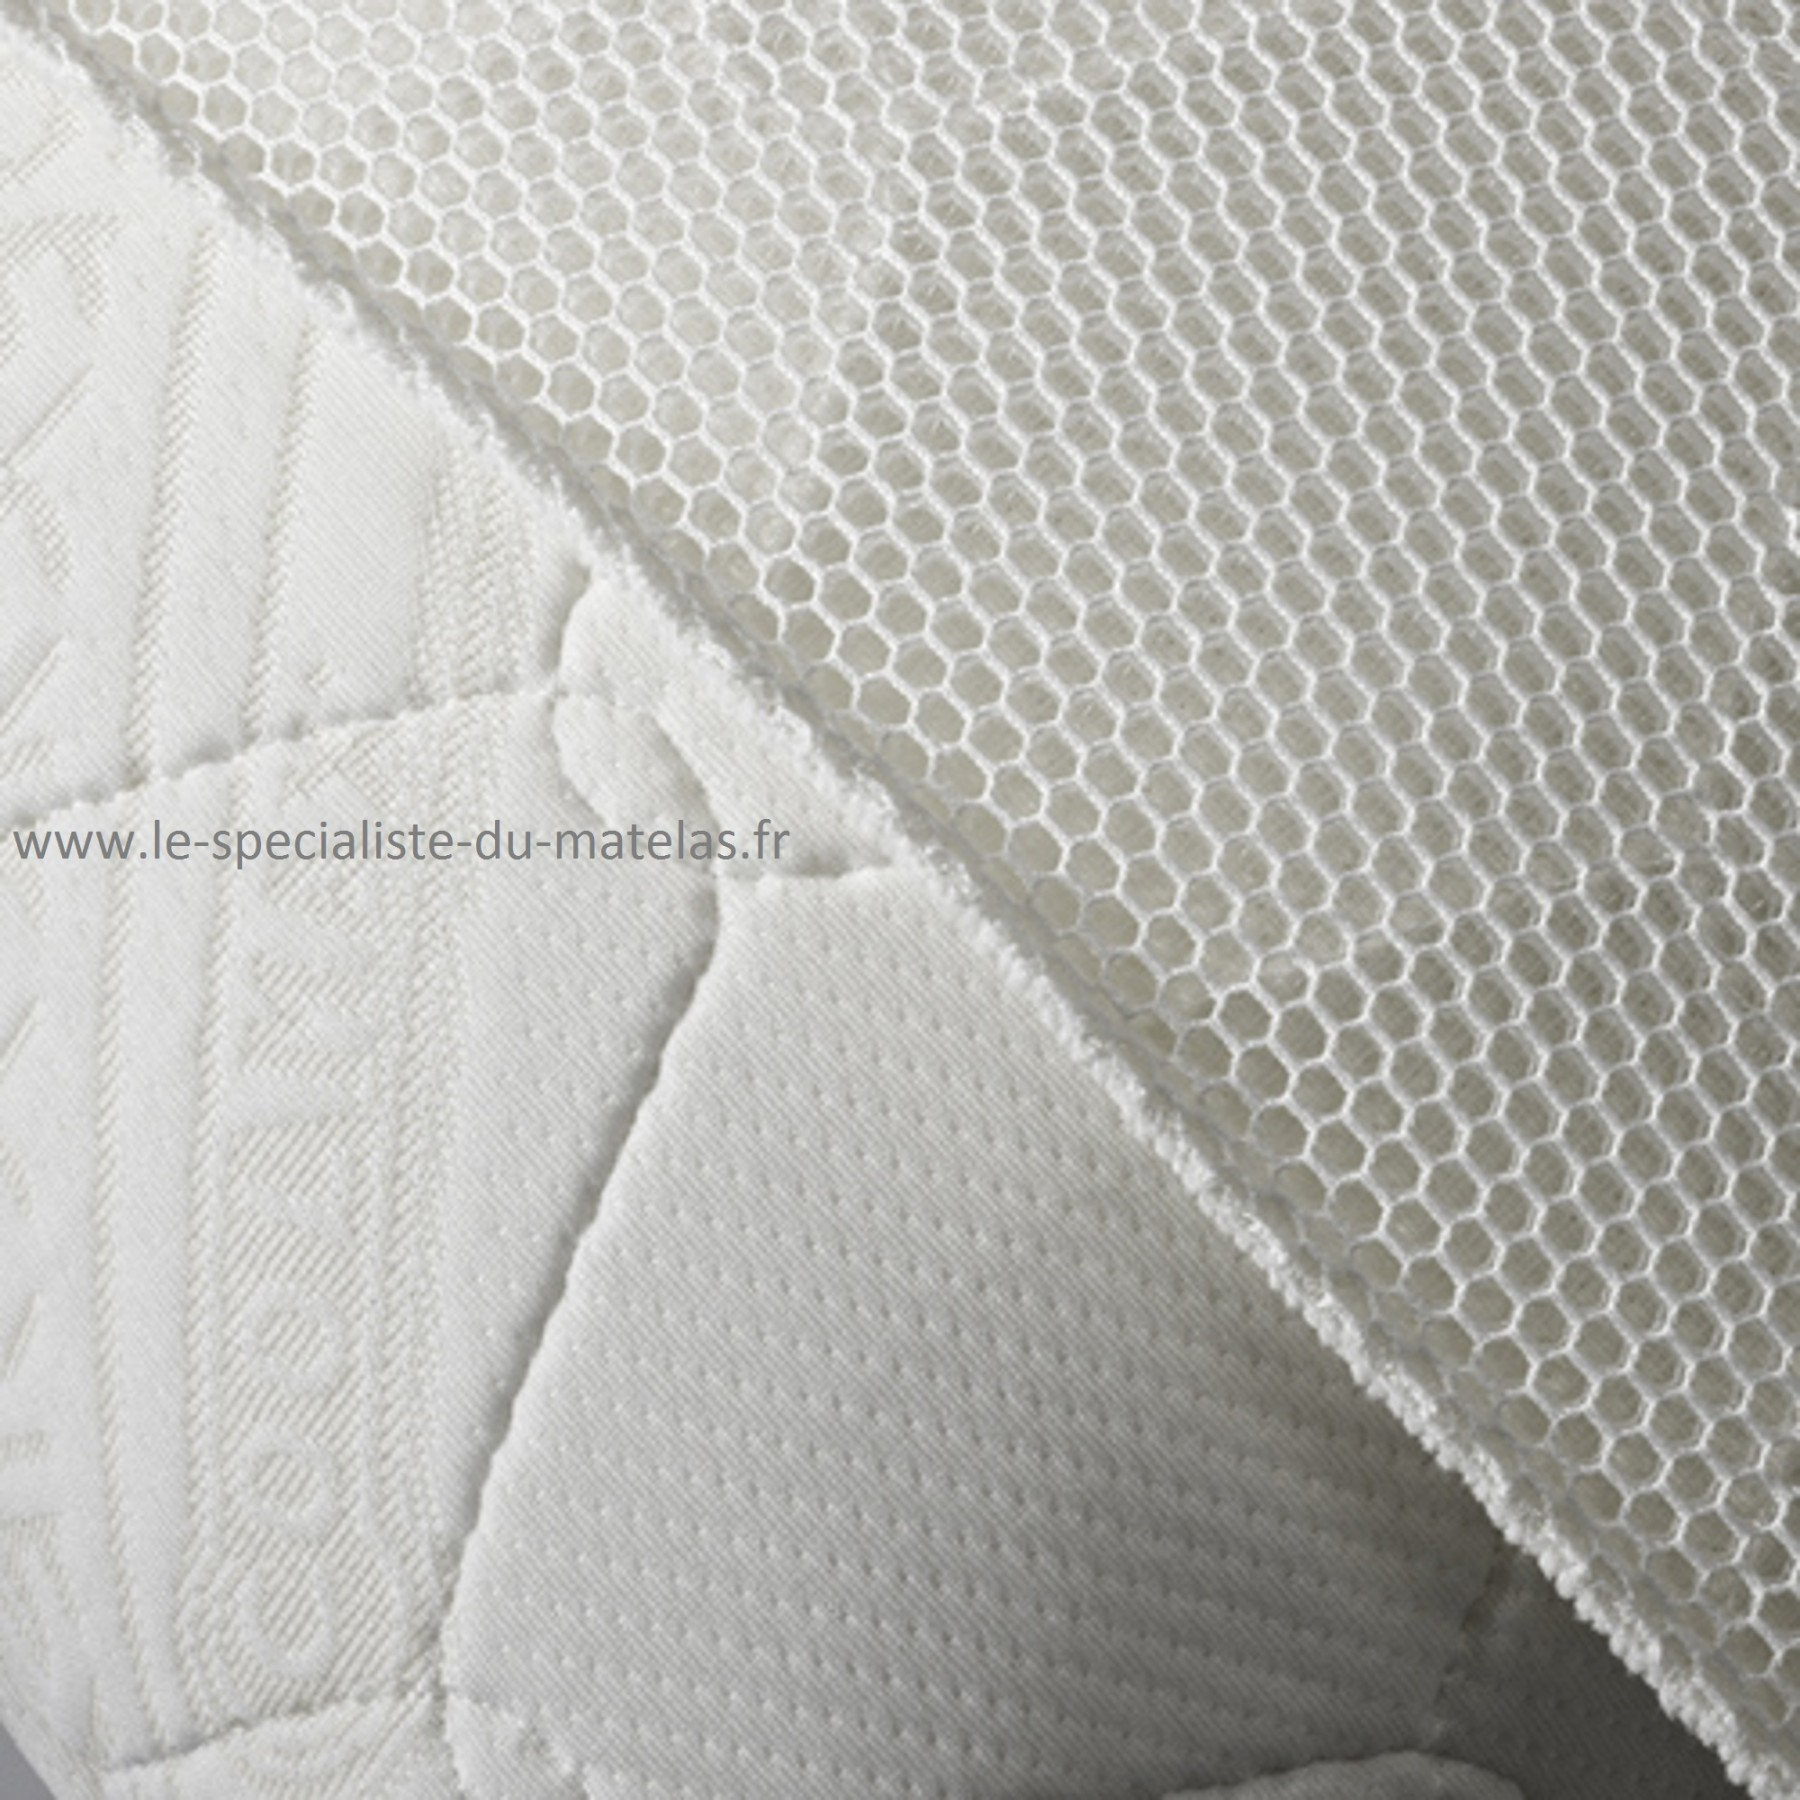 prot ge matelas anti transpiration cgmrotterdam. Black Bedroom Furniture Sets. Home Design Ideas